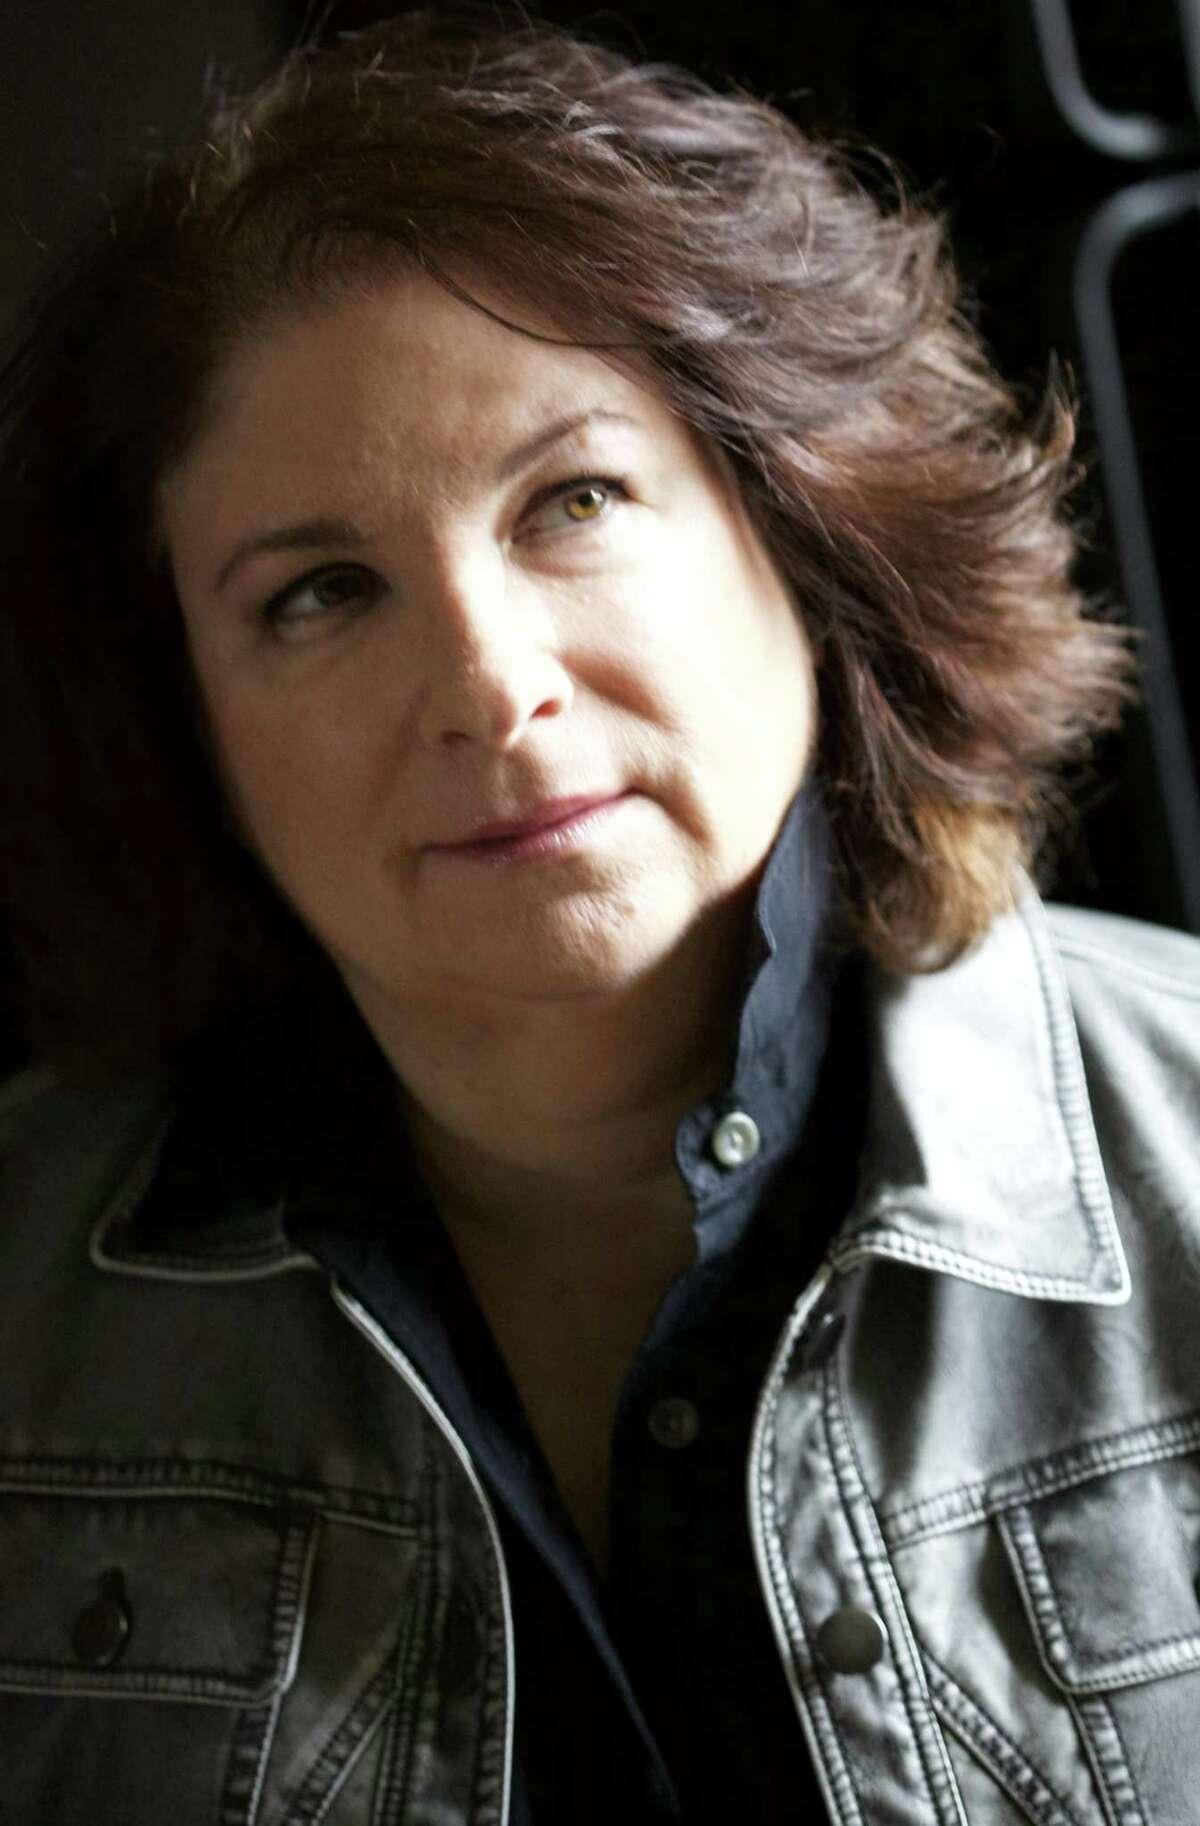 Randi Minetor, author of